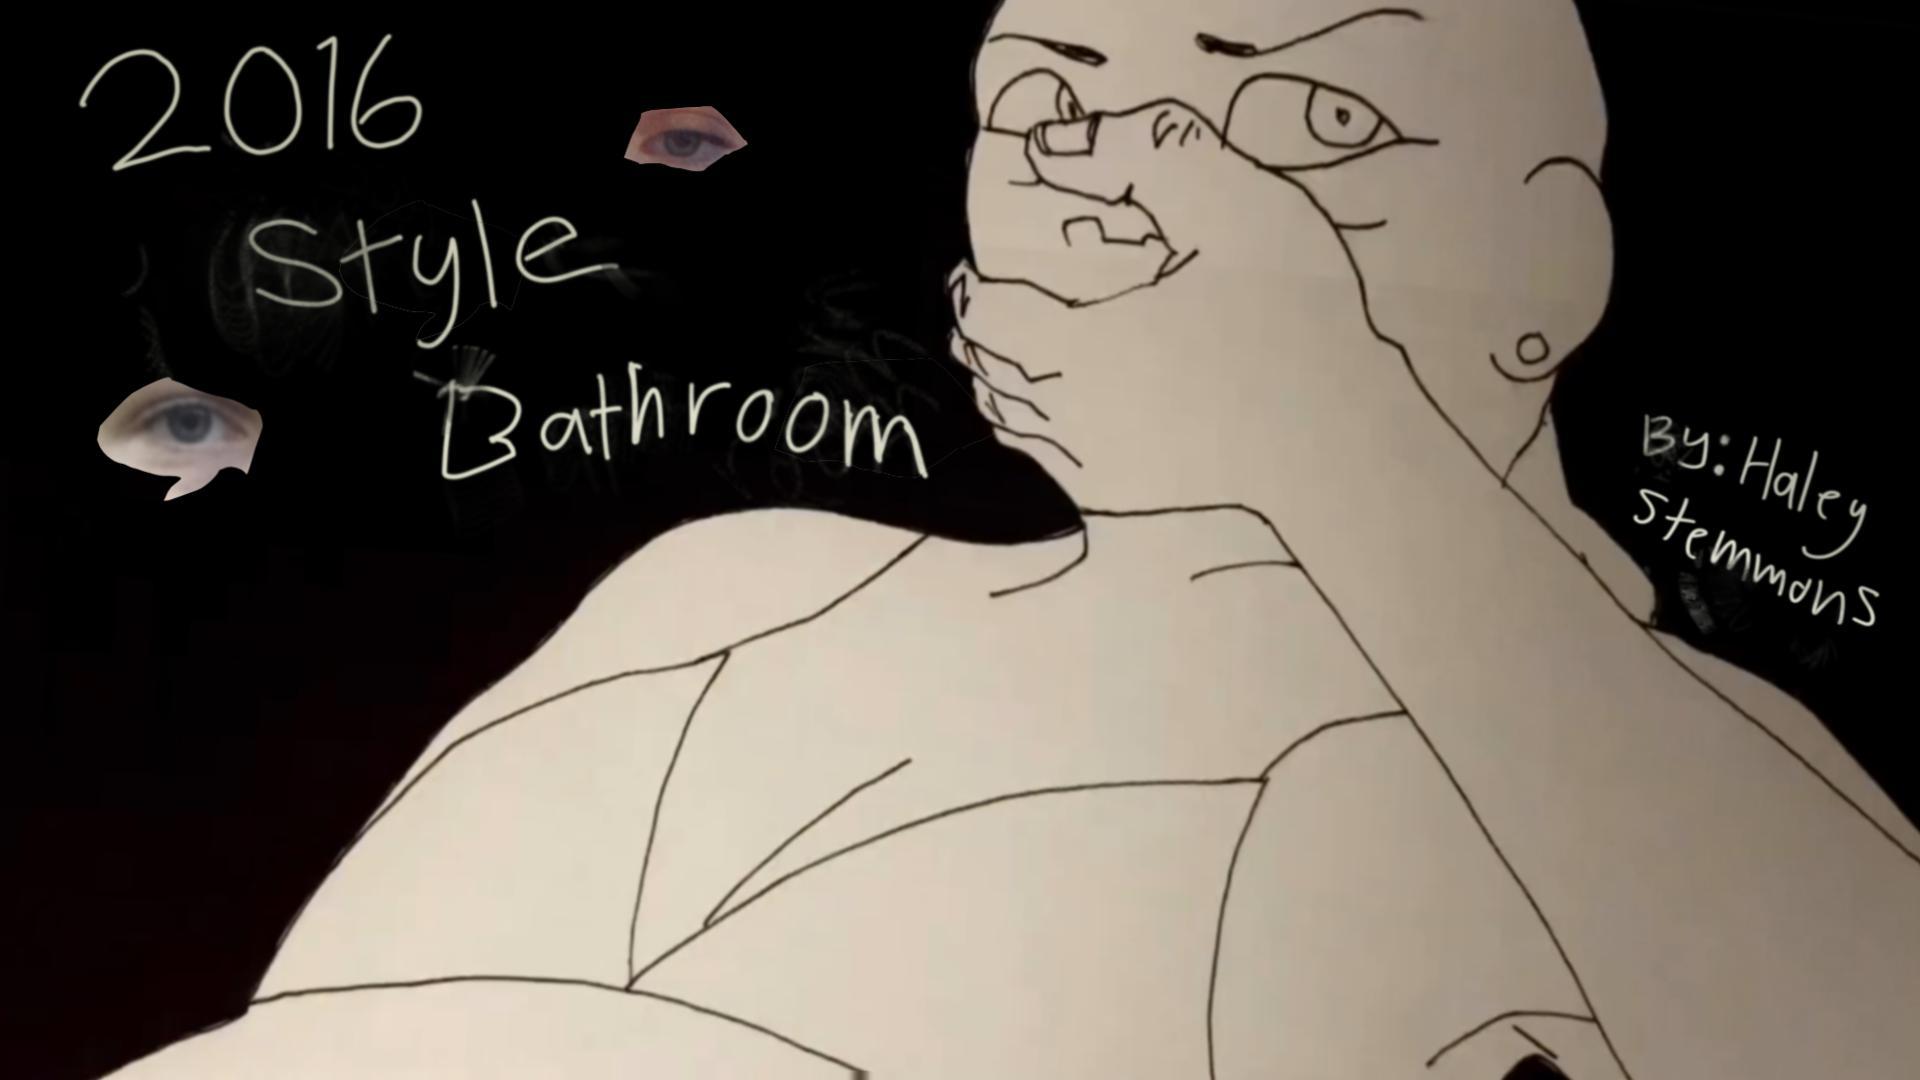 2016 Style Bathroom